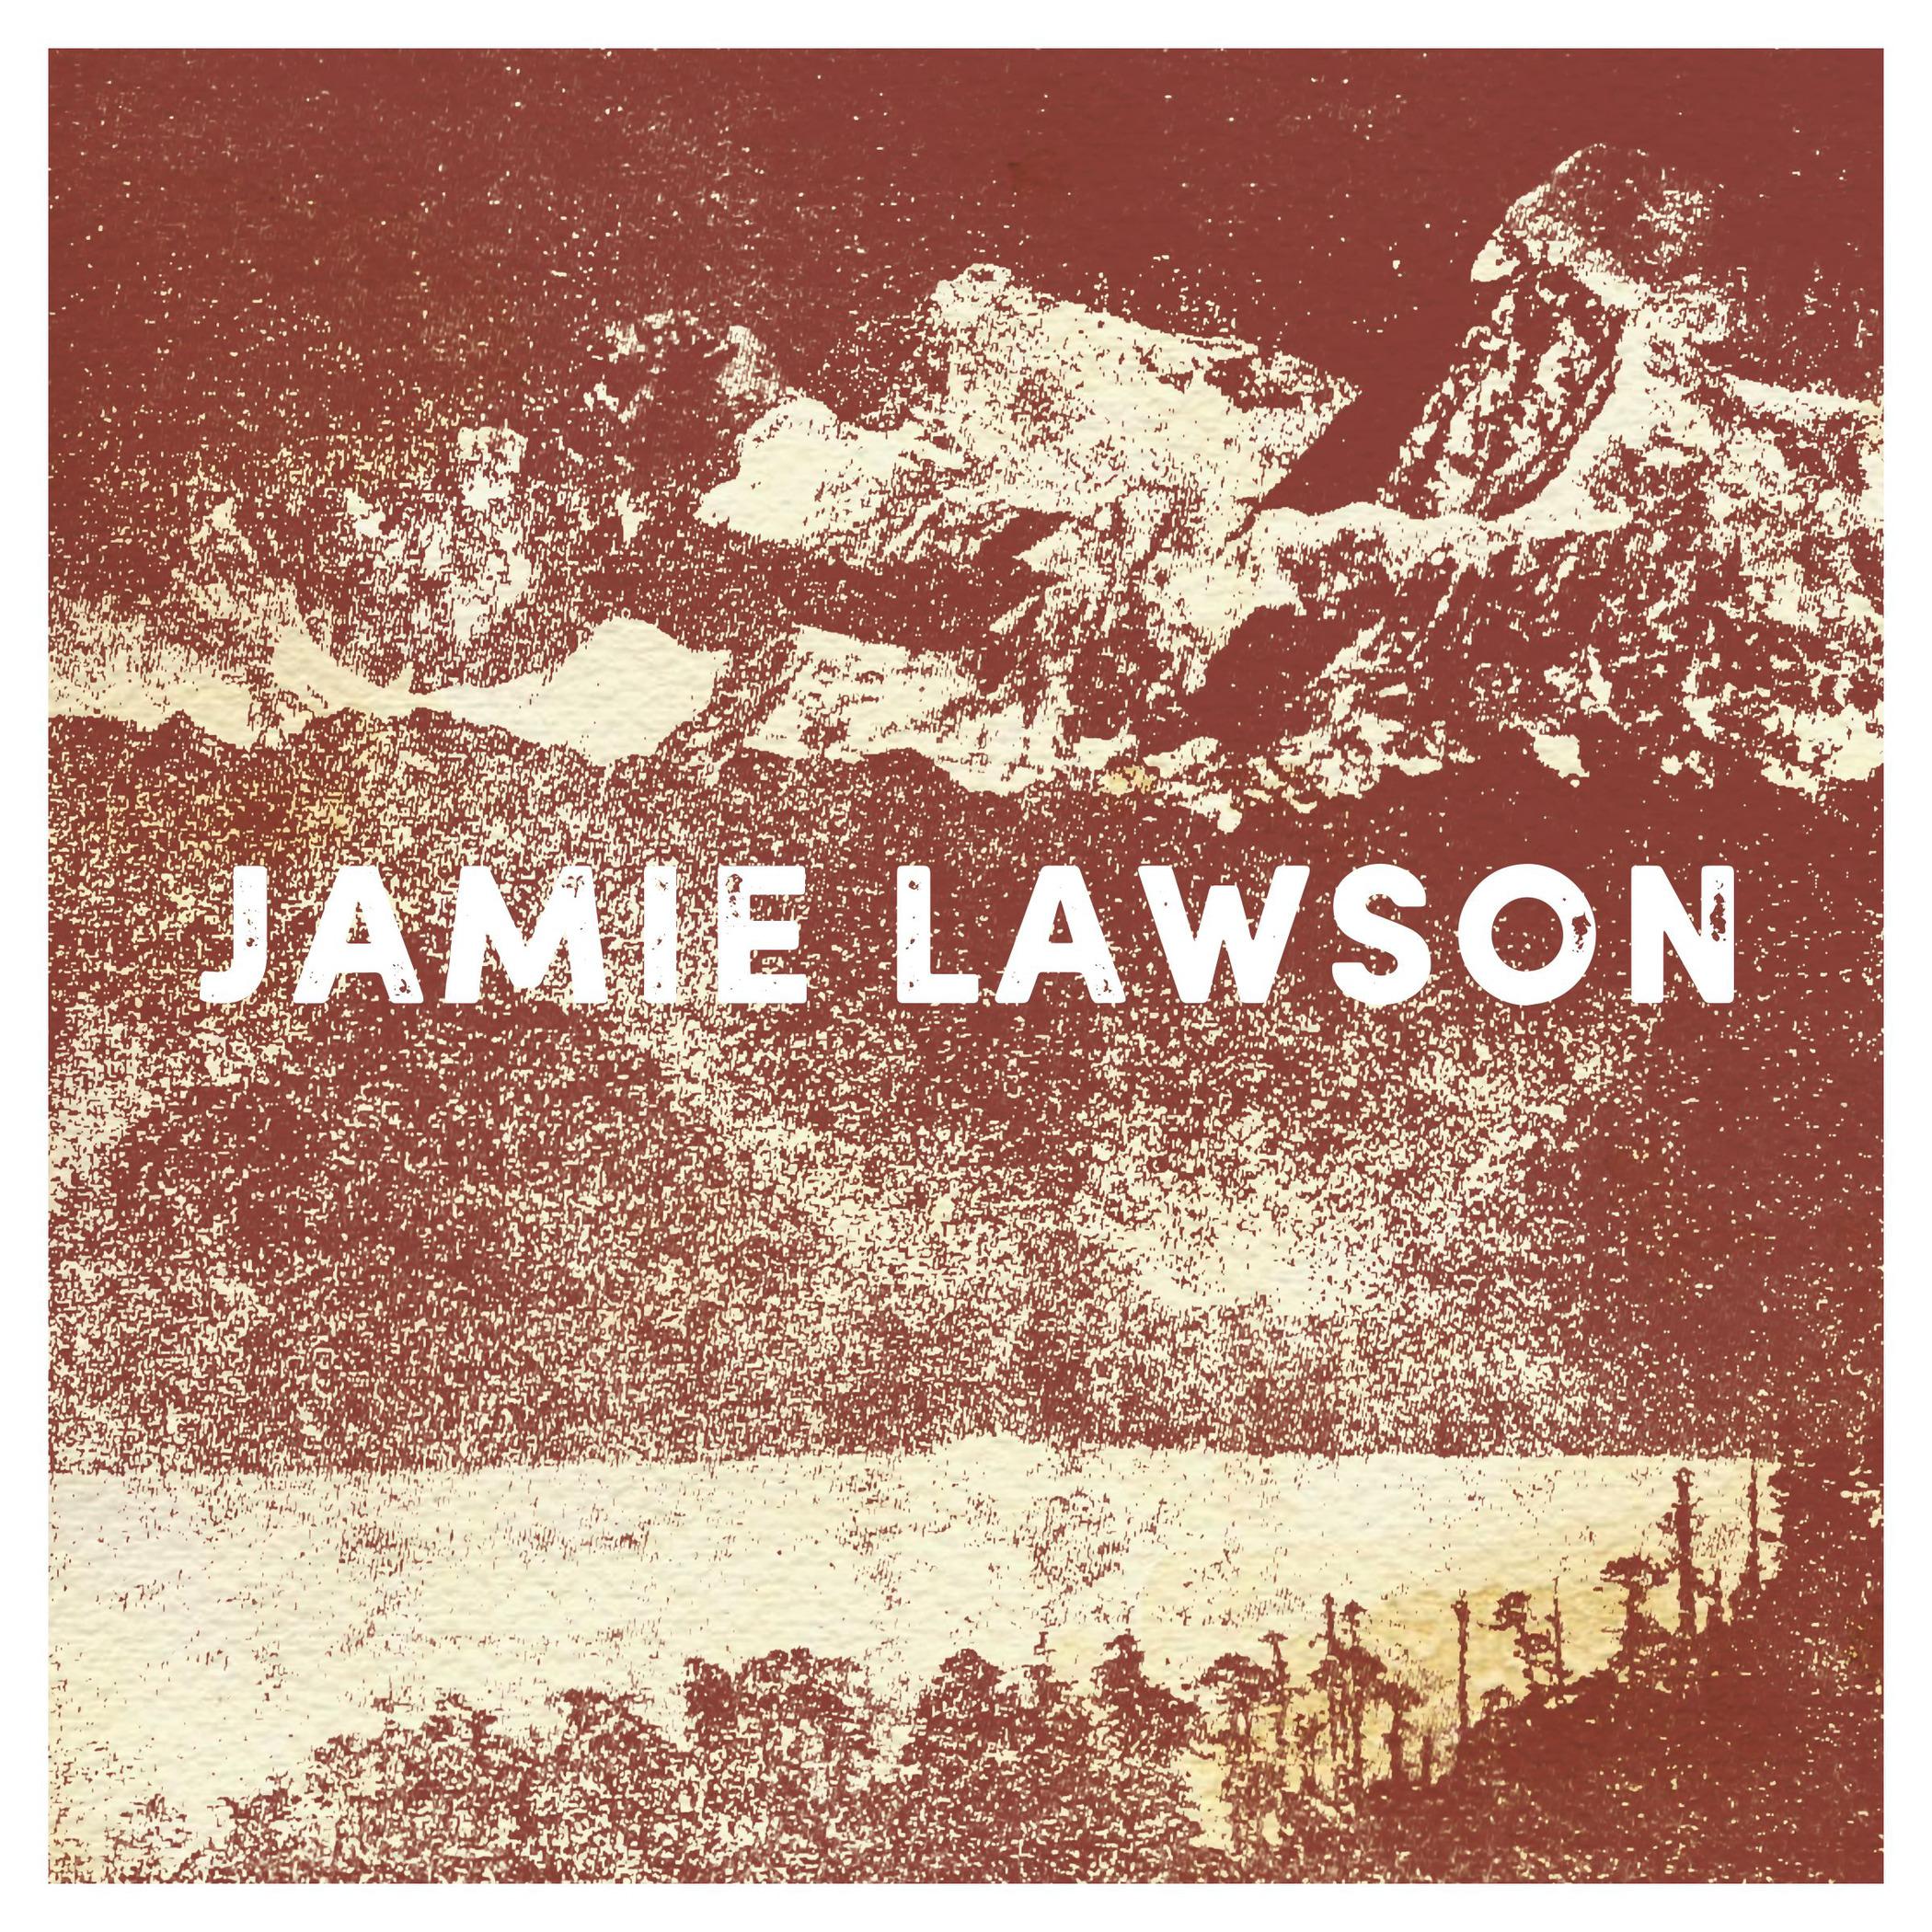 Jamie_Lawson_-_Jamie_Lawson_(Album_Artwork).jpg